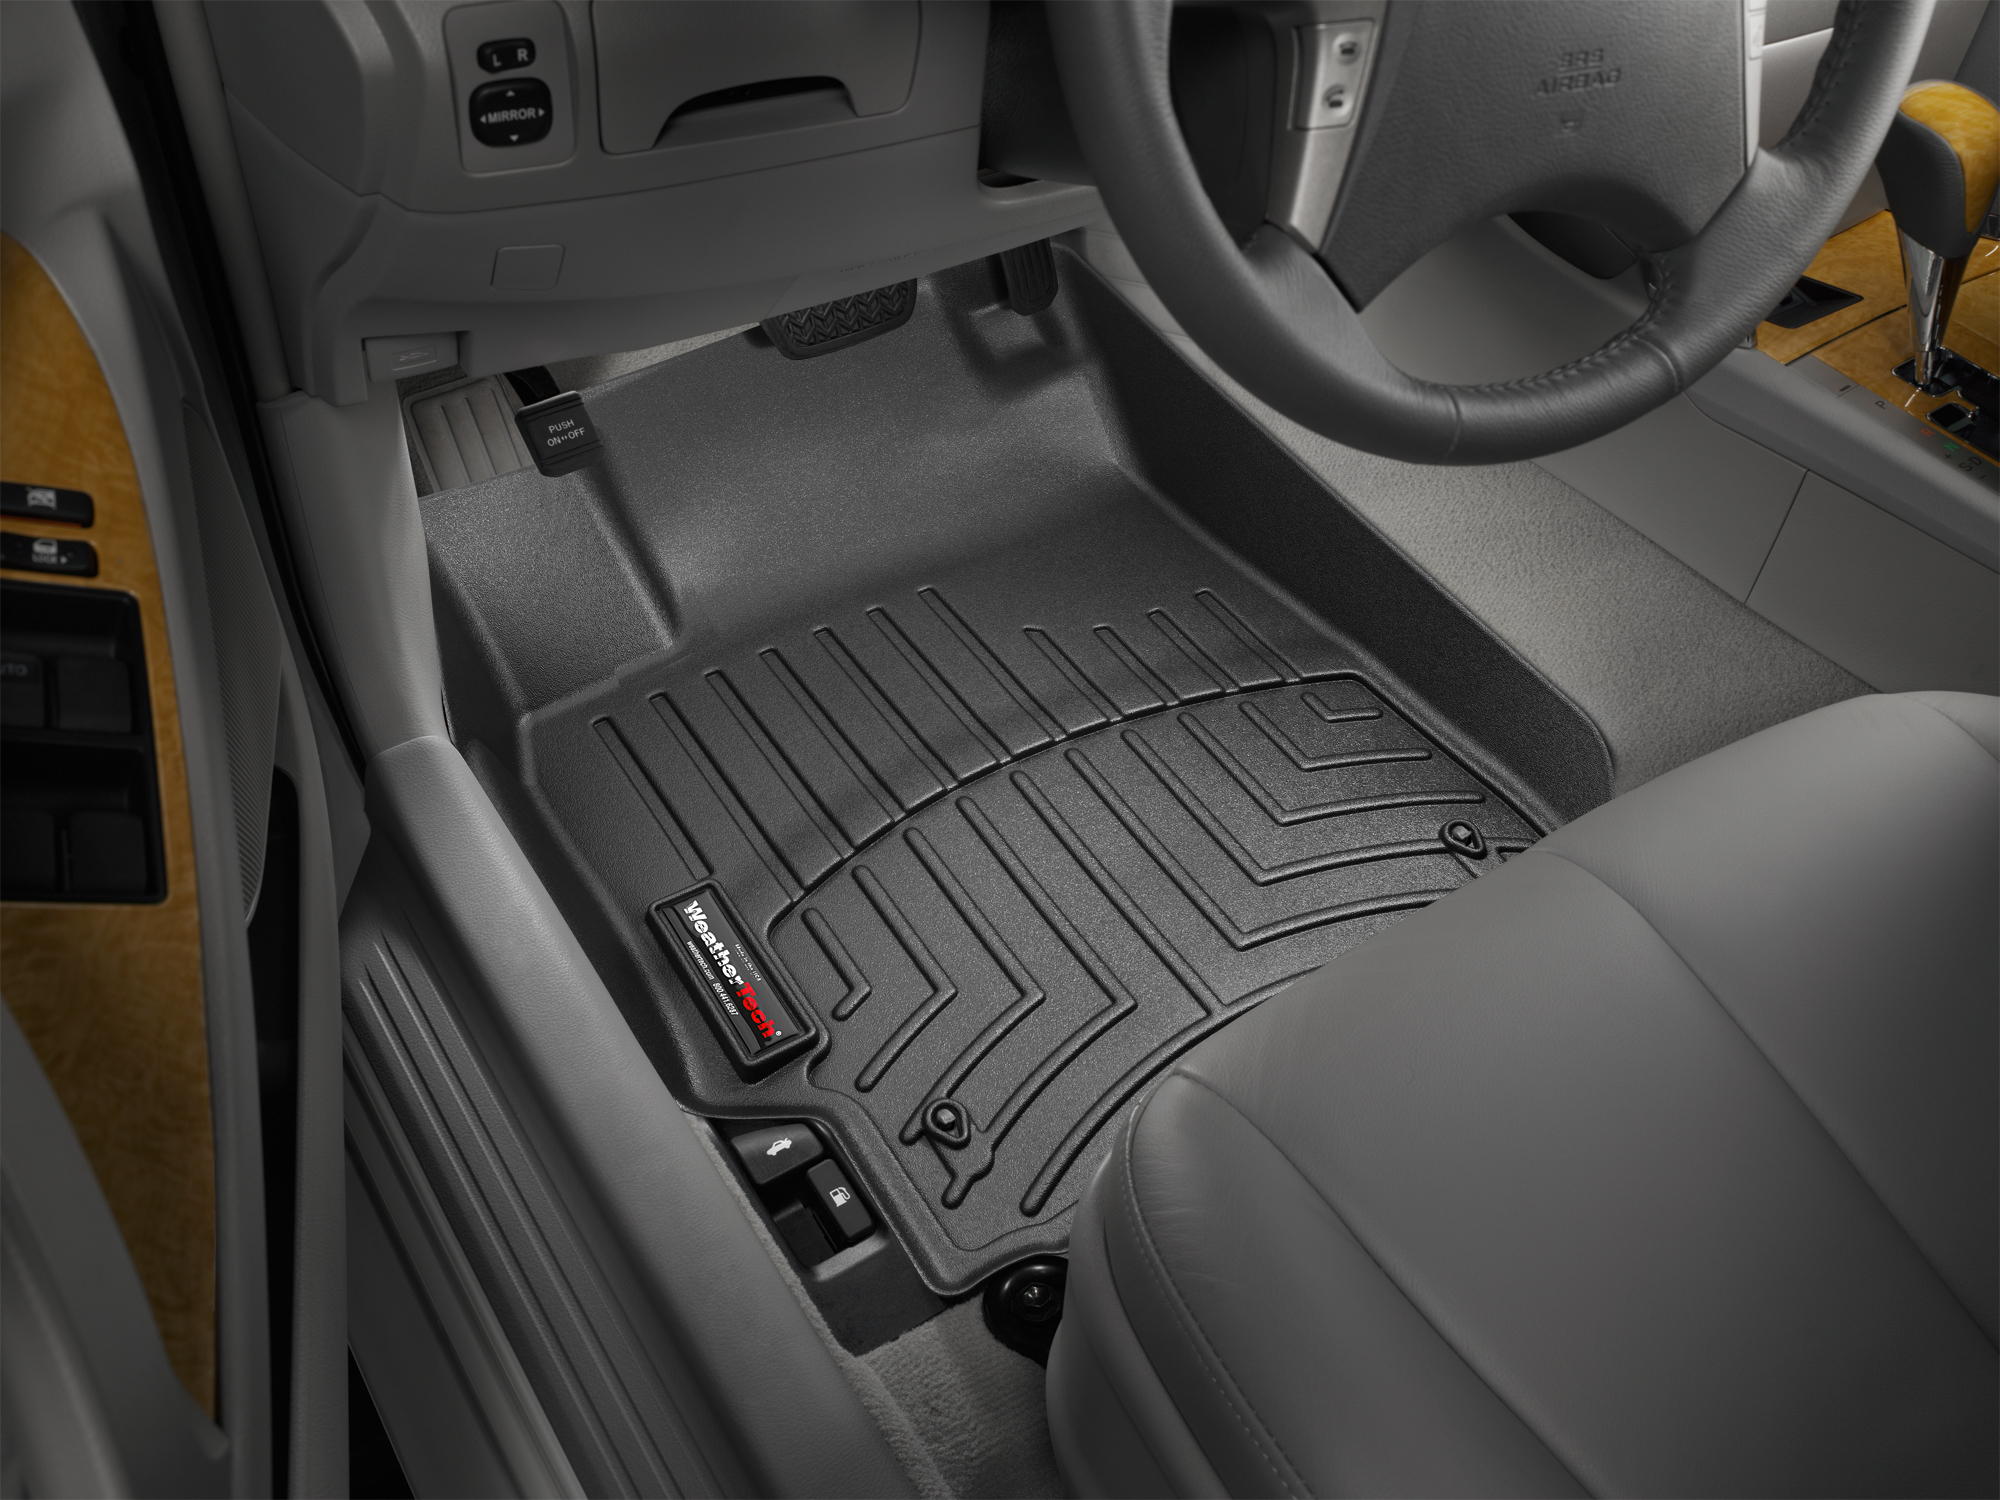 2010 Toyota Camry Avm Hd Floor Mats Heavy Duty Flexible Trim To Fit Weathertech